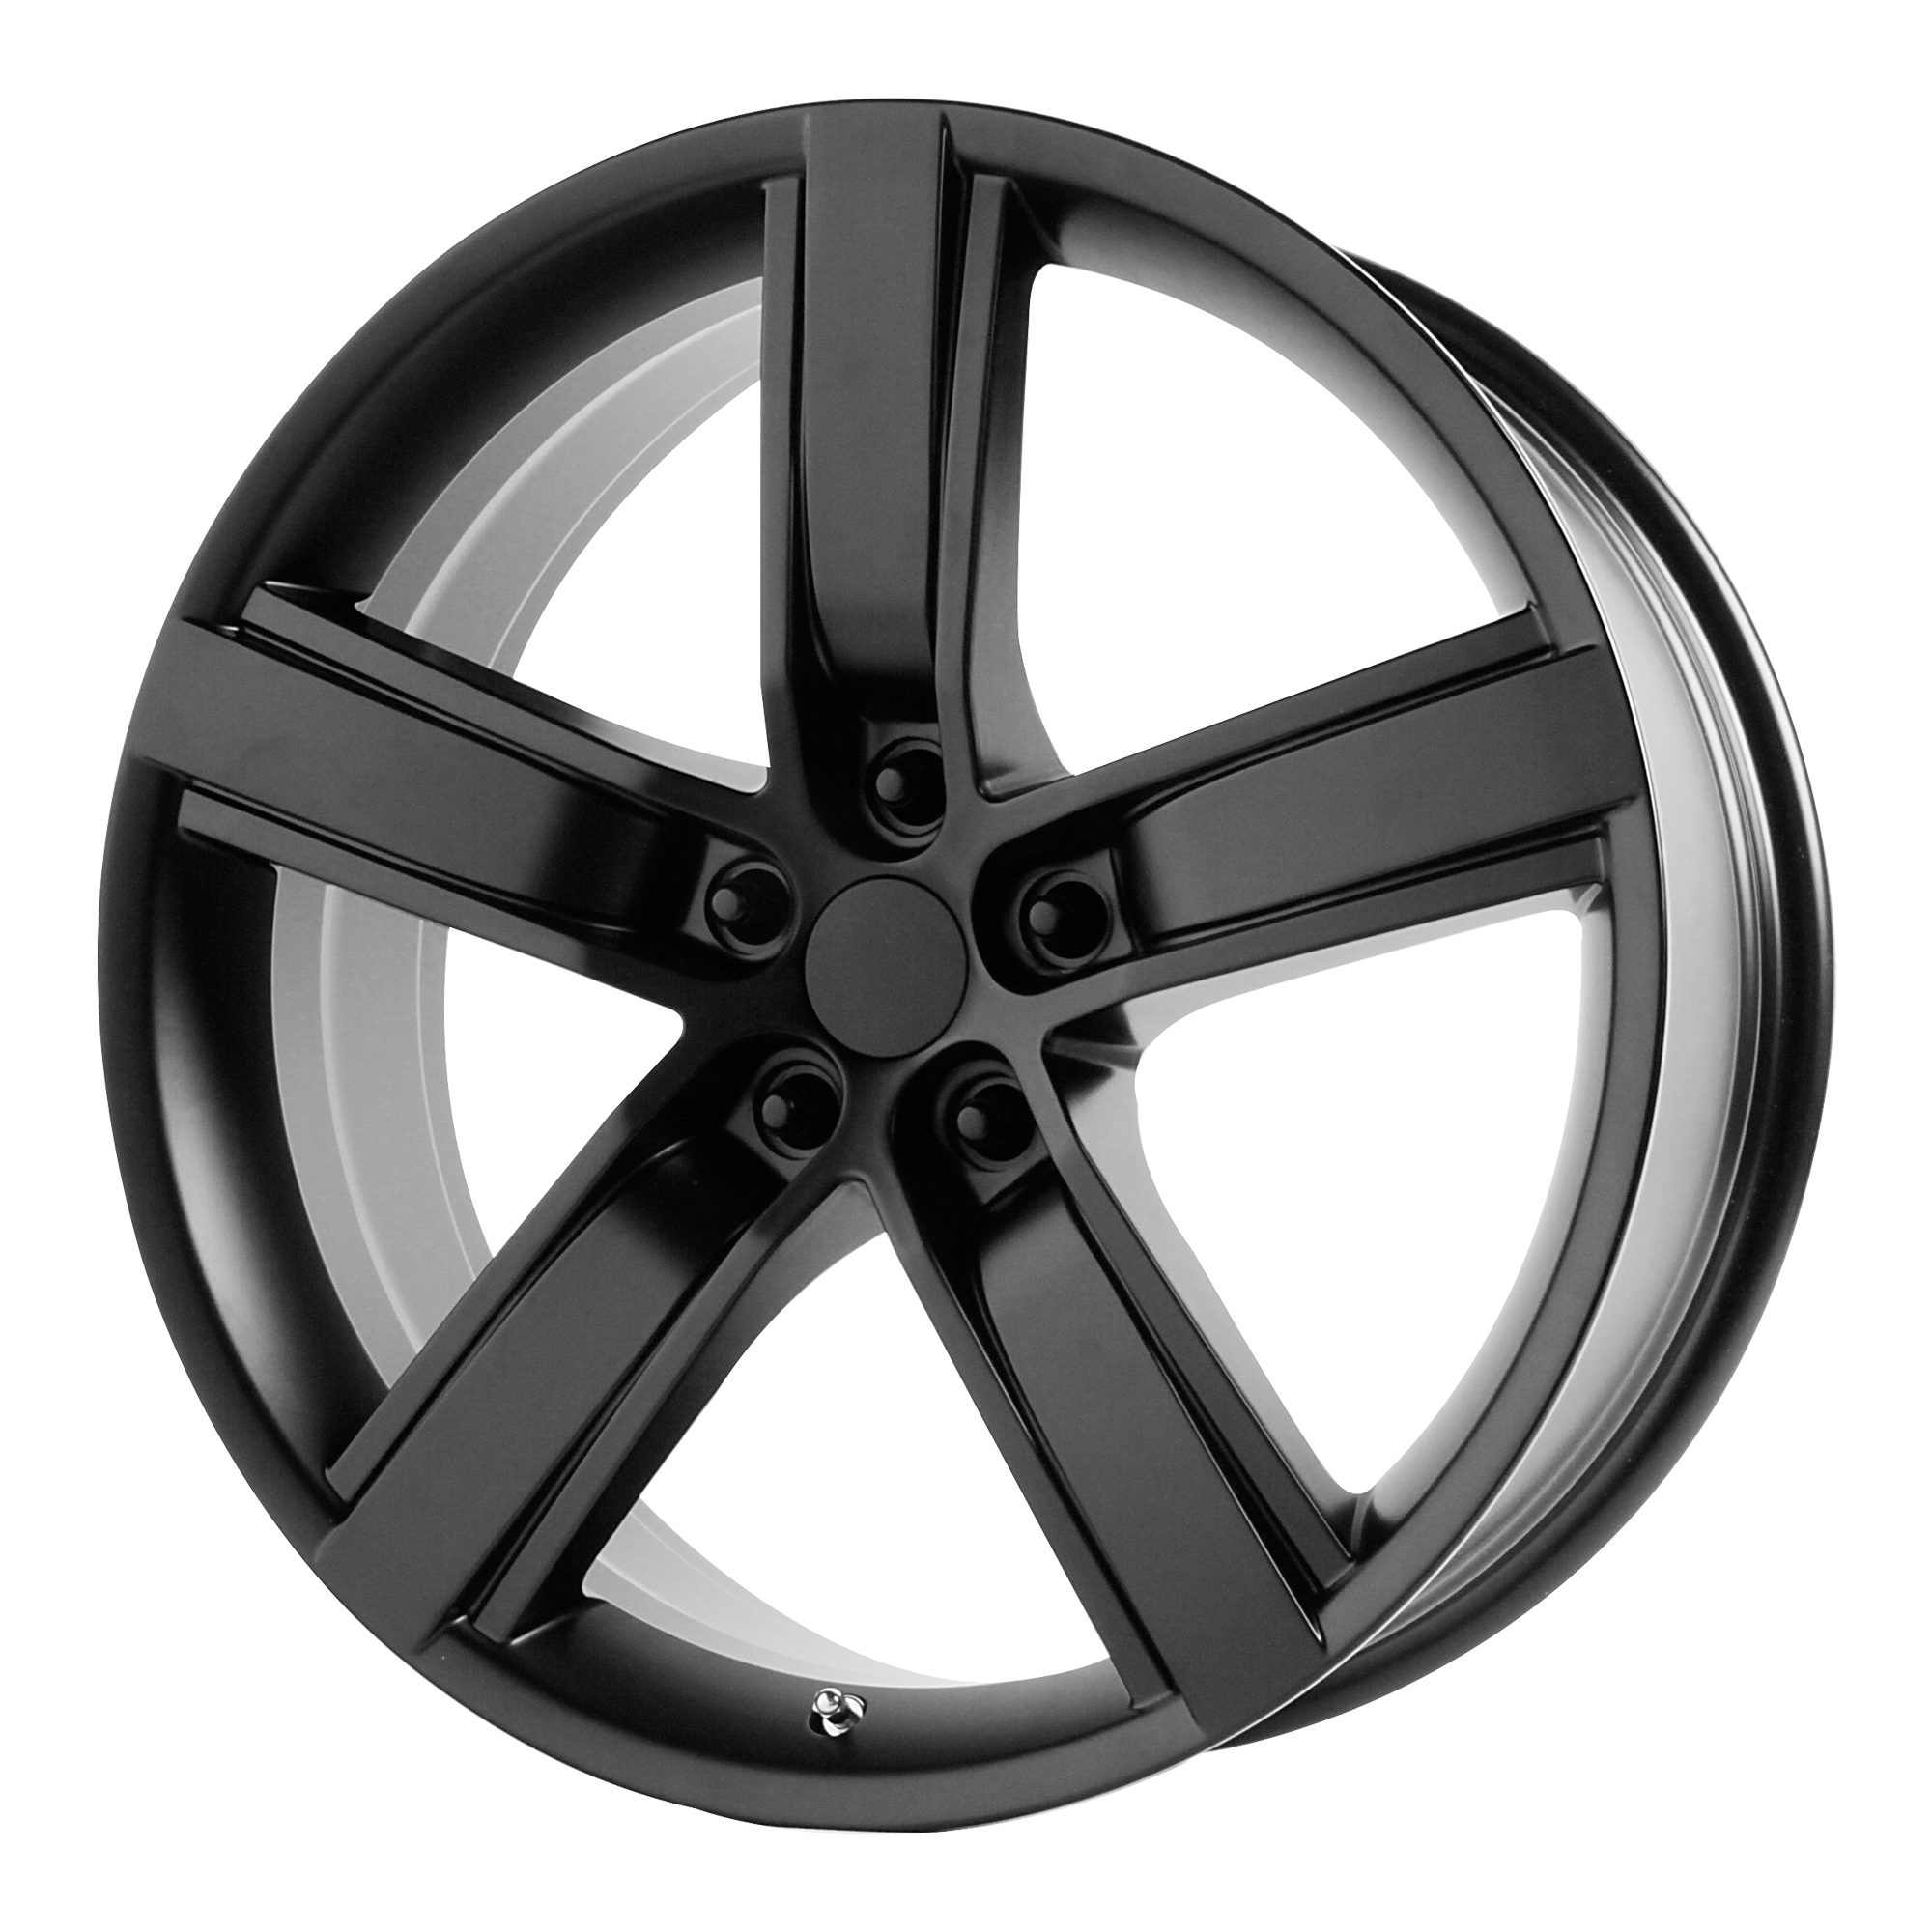 OE Creations Replica Wheels OE Creations PR134 Matte Black